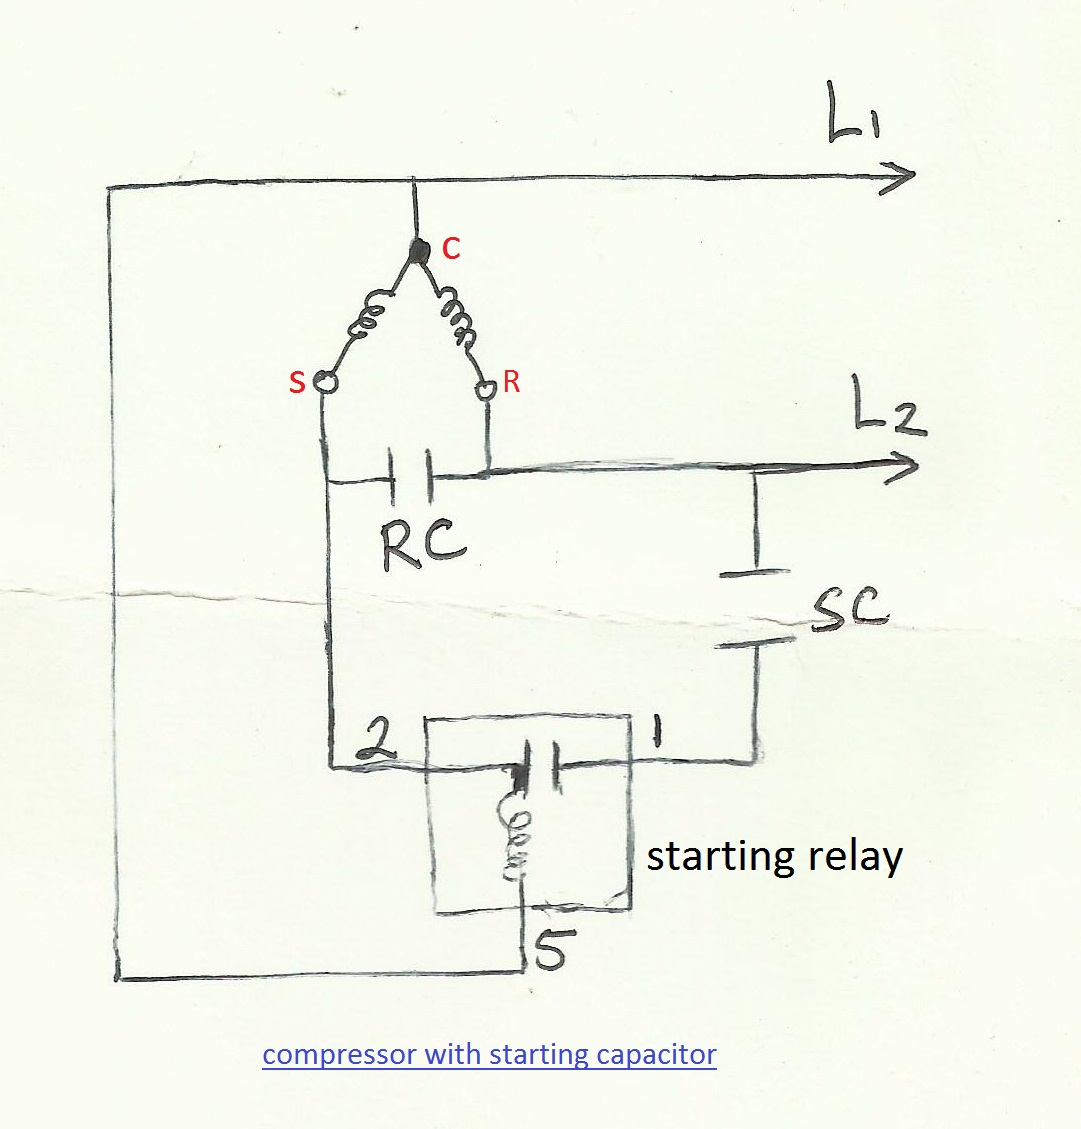 copeland scroll wiring diagram refrigeration [ 1081 x 1129 Pixel ]